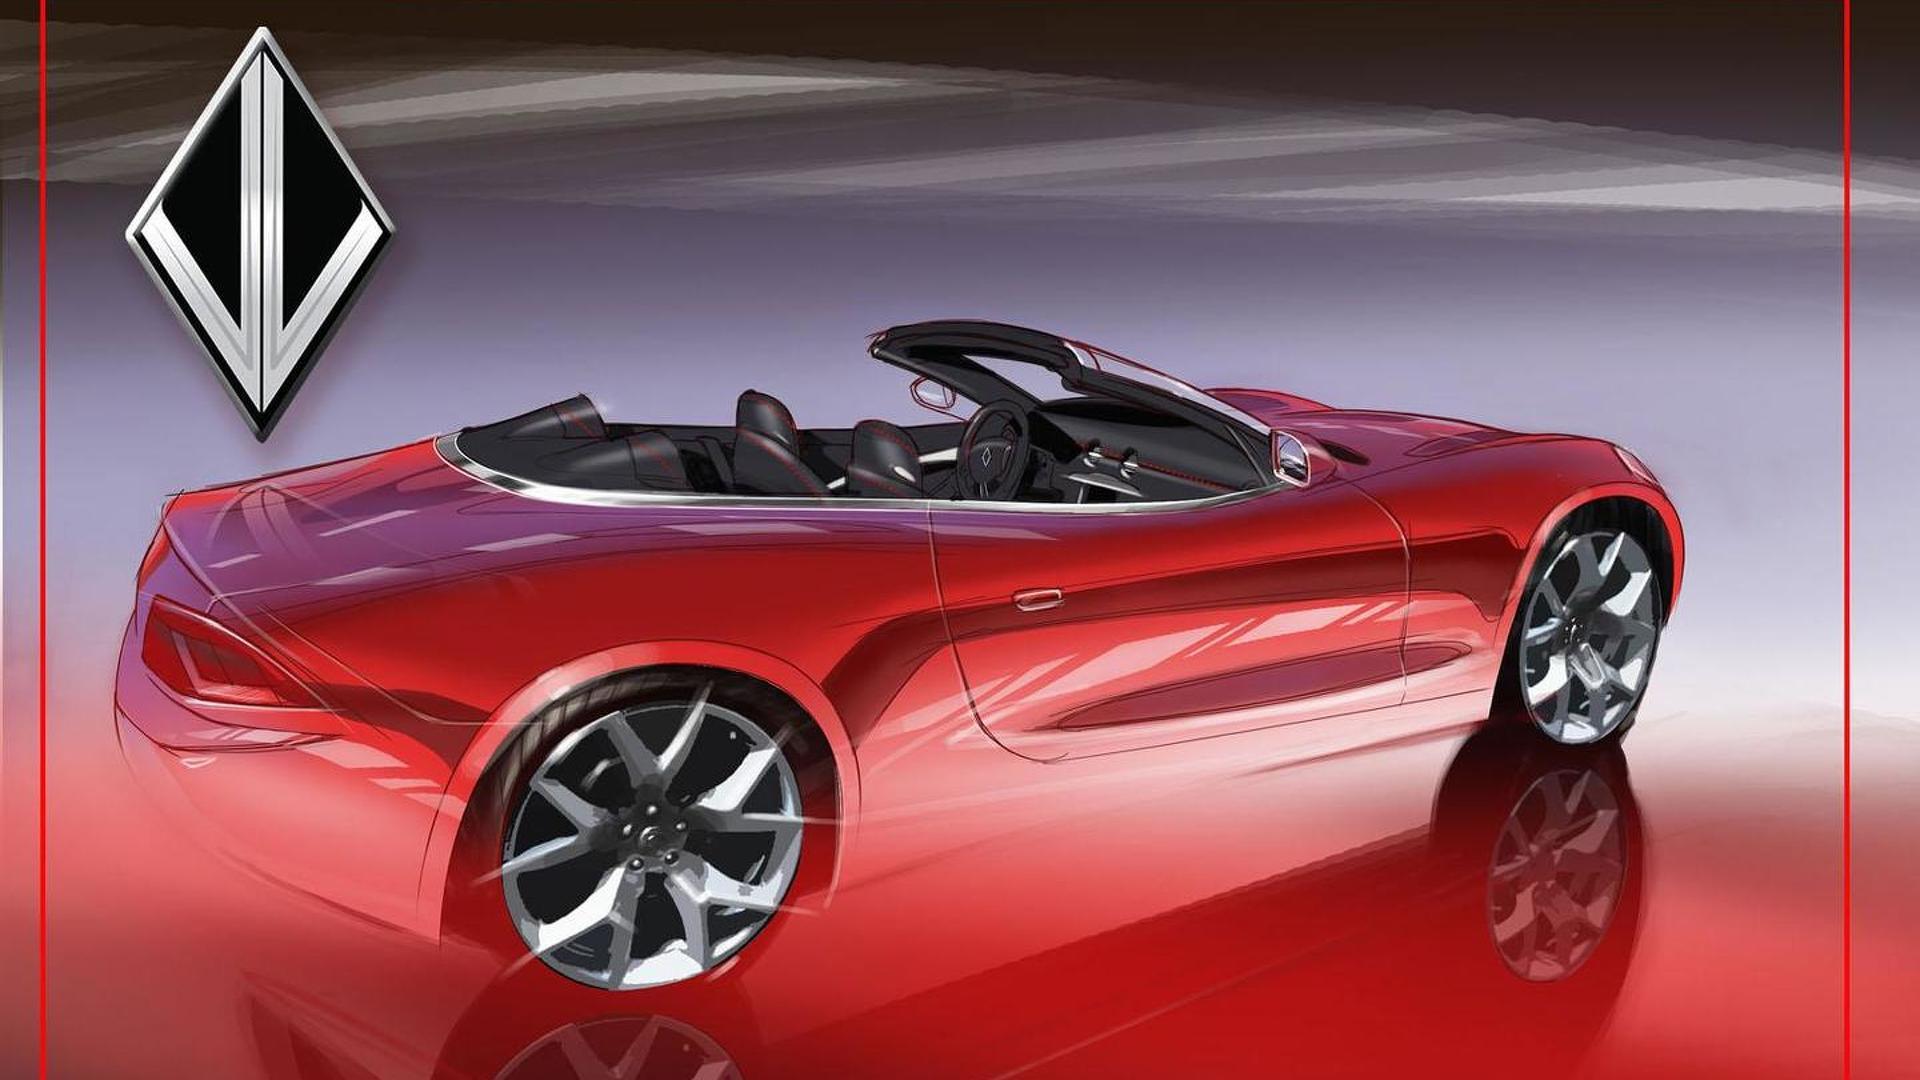 VL Automotive teases a Destino convertible concept for Detroit